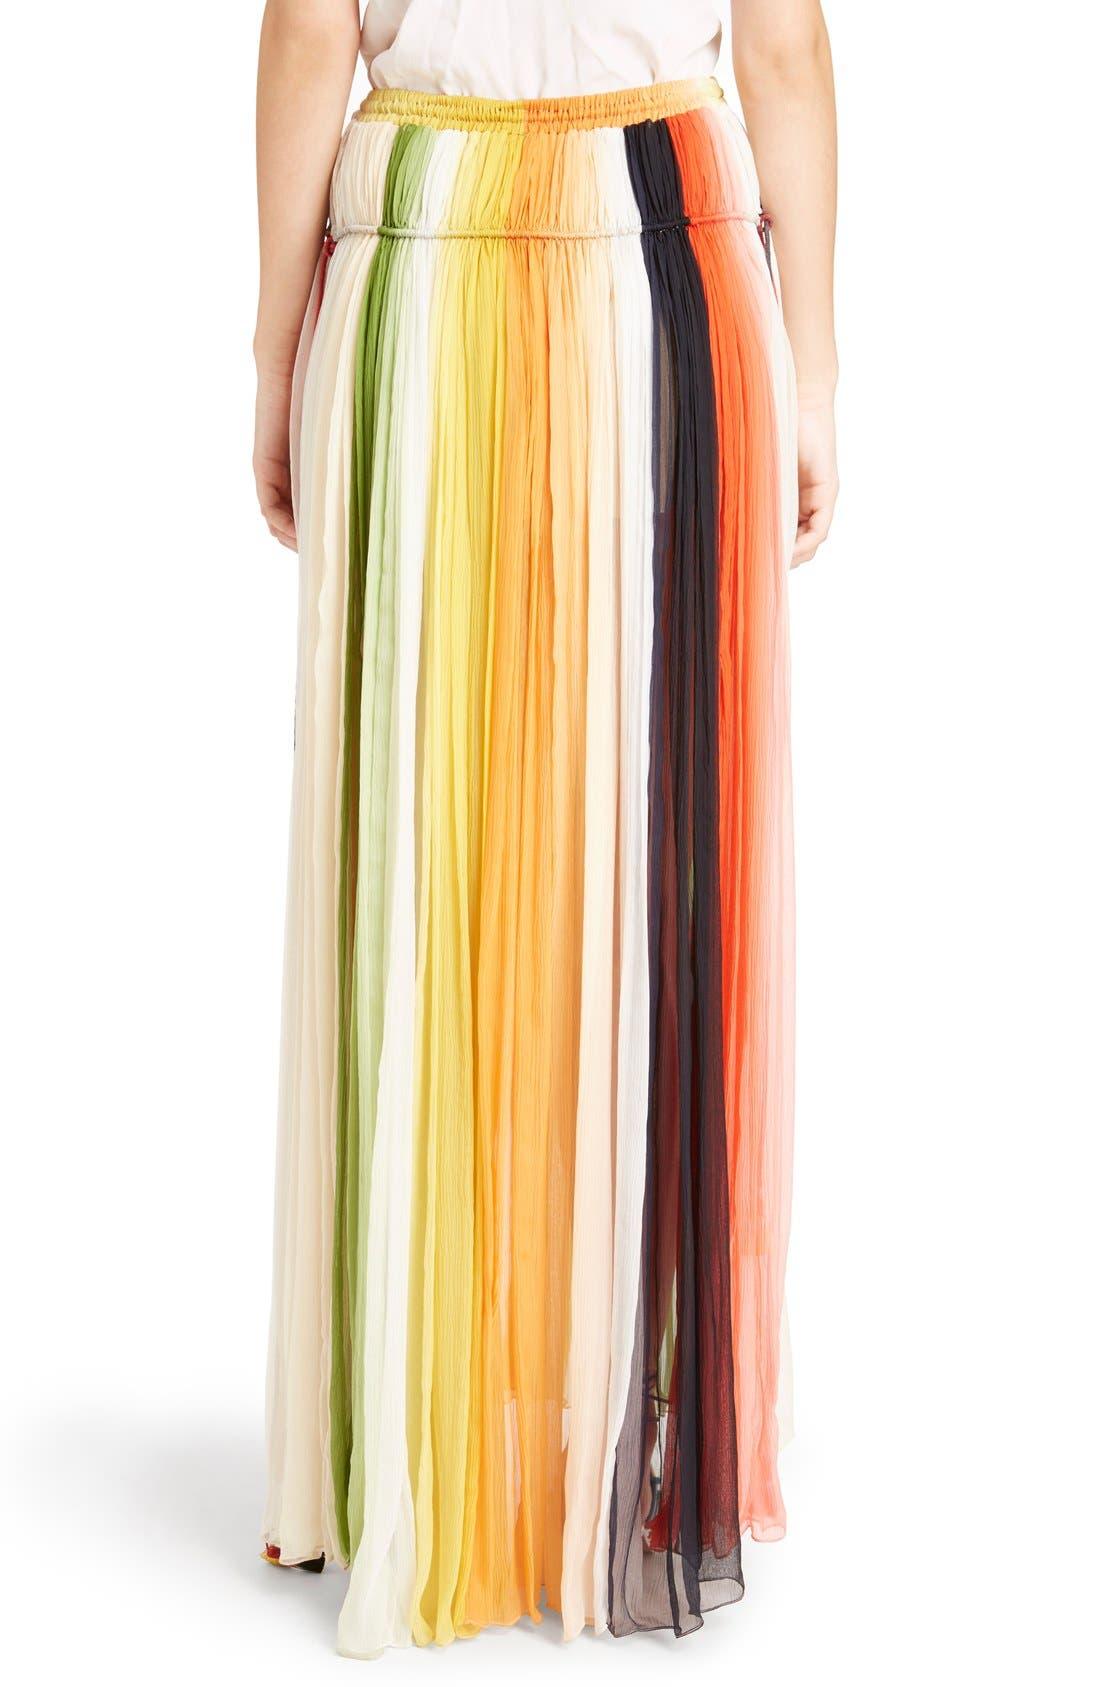 Stripe Pleated Silk Skirt with Tassels,                             Alternate thumbnail 3, color,                             Orange/ Green